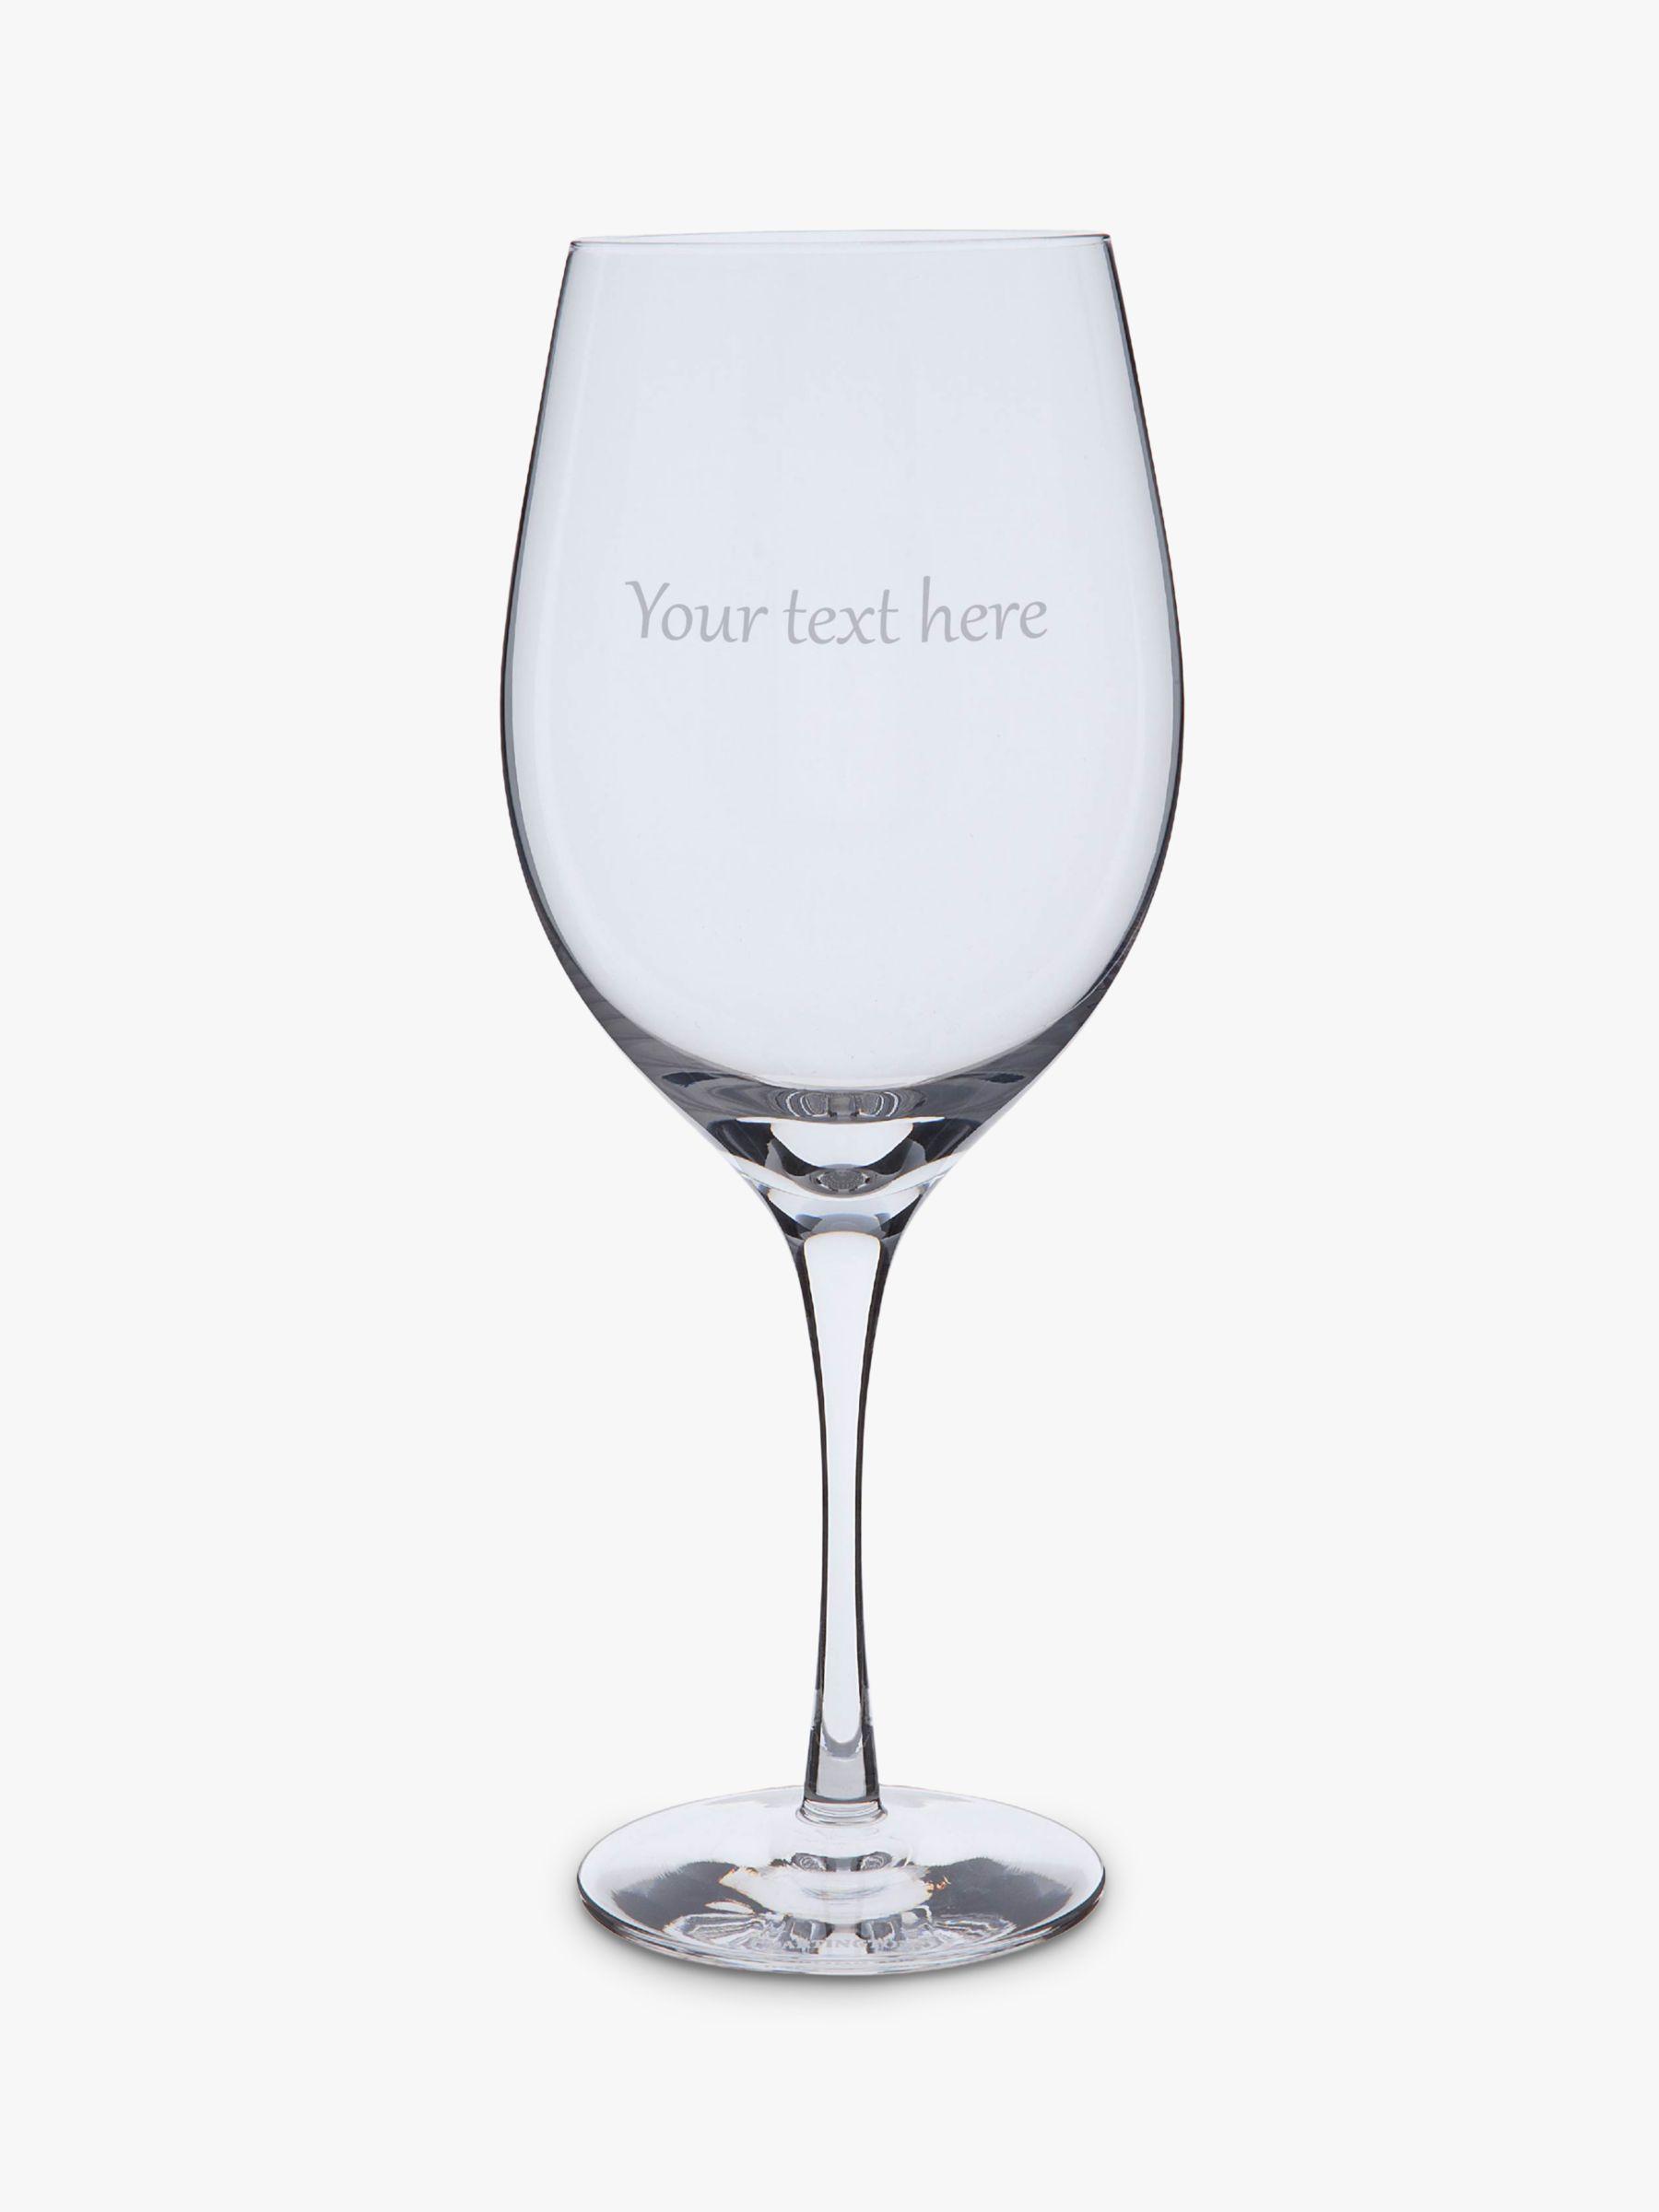 Dartington Crystal Dartington Crystal Personalised Bordeaux Red Wine Glass, Gabriola Font, 600ml